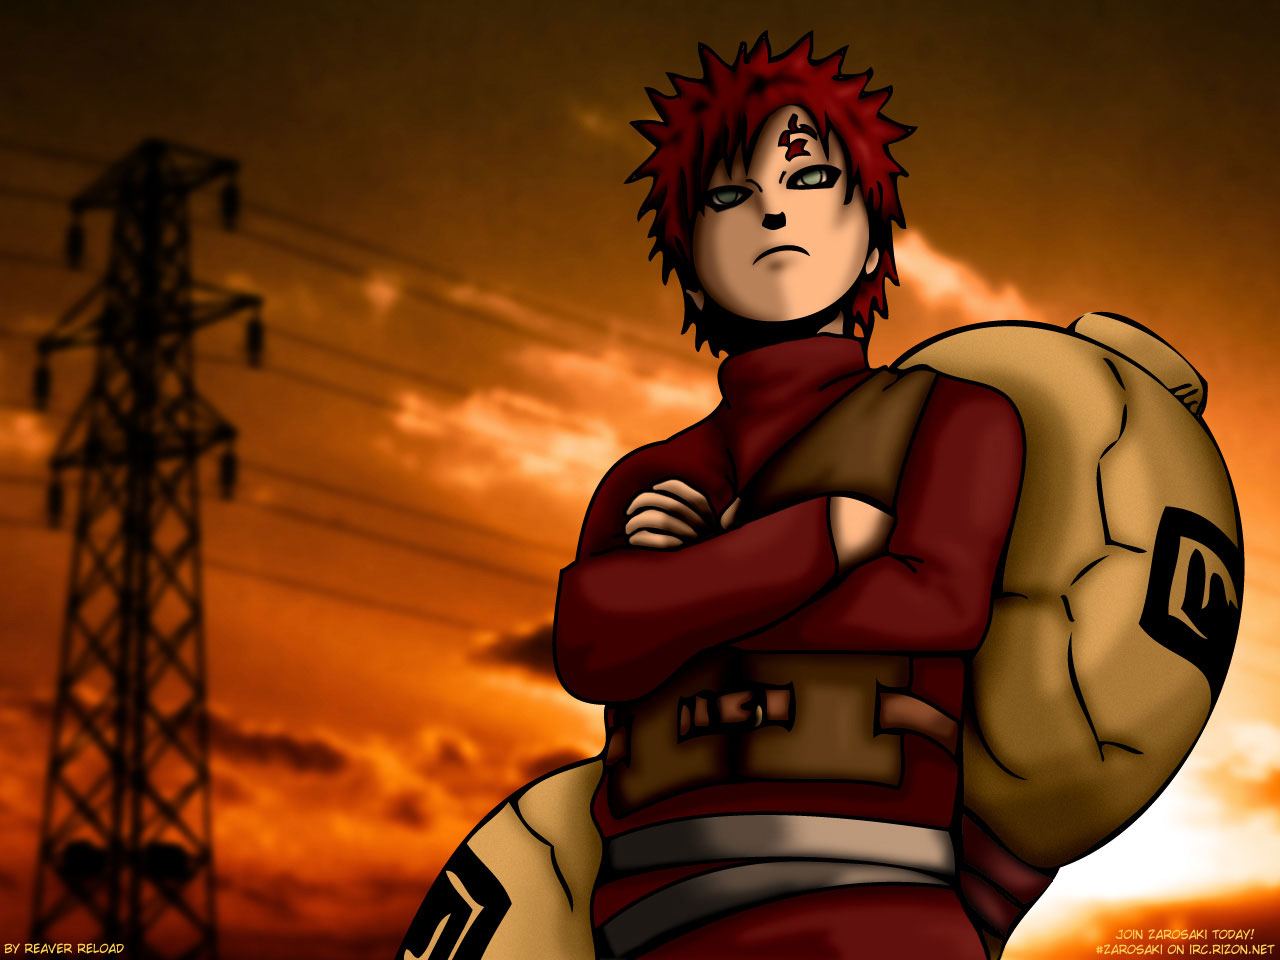 Download Anime Wallpaper Gaara HD Naruto Movie 1280x960